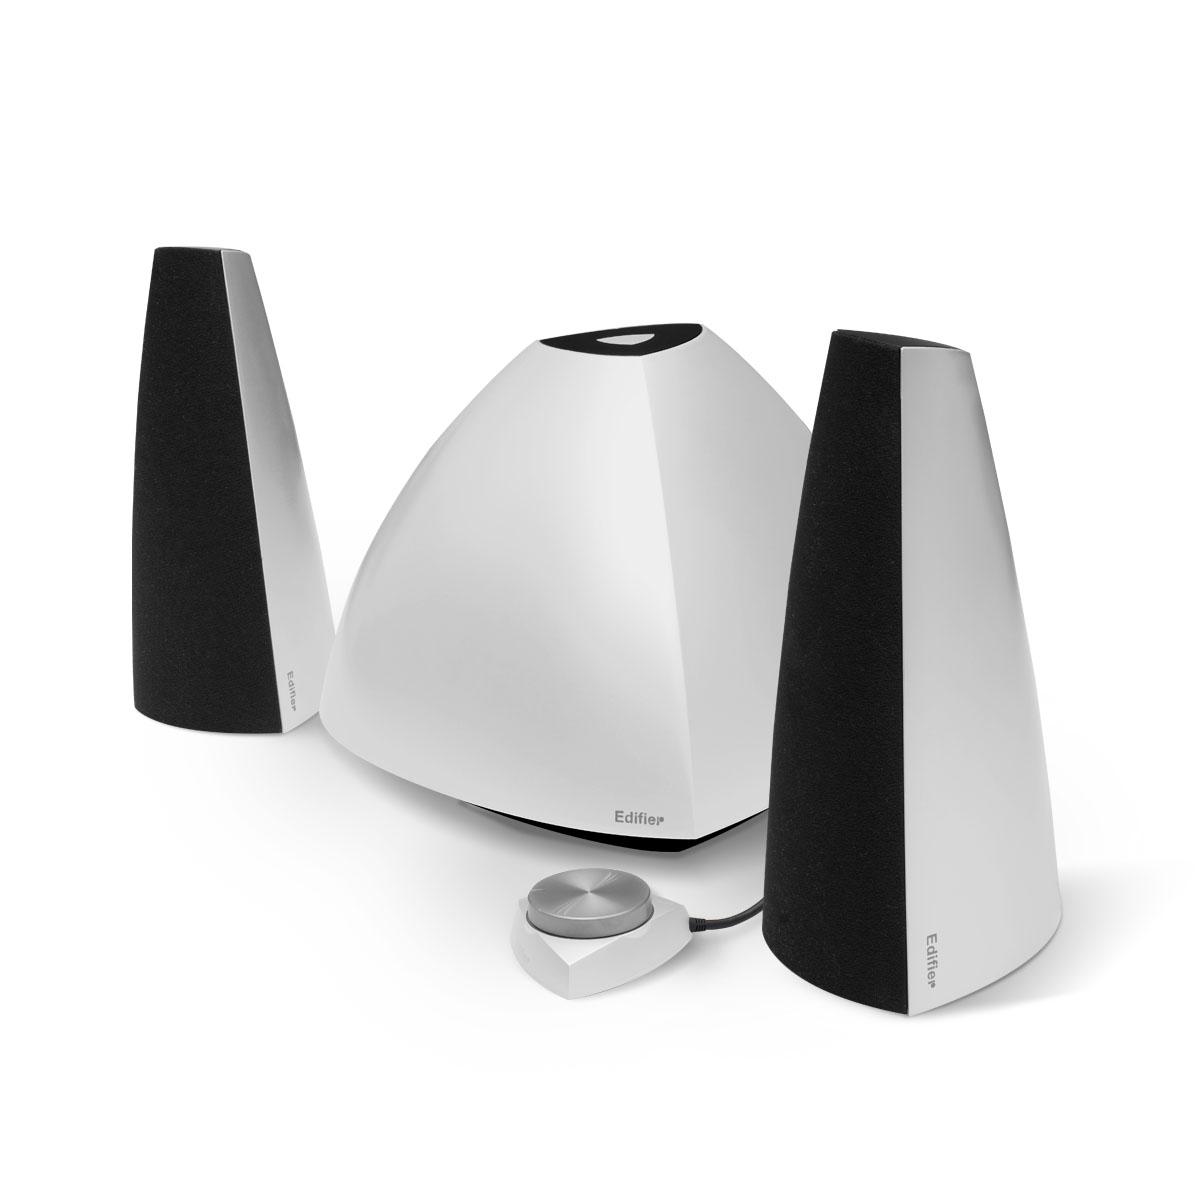 E3350 Prisma 2.1 Bluetooth Speakers Subwoofer